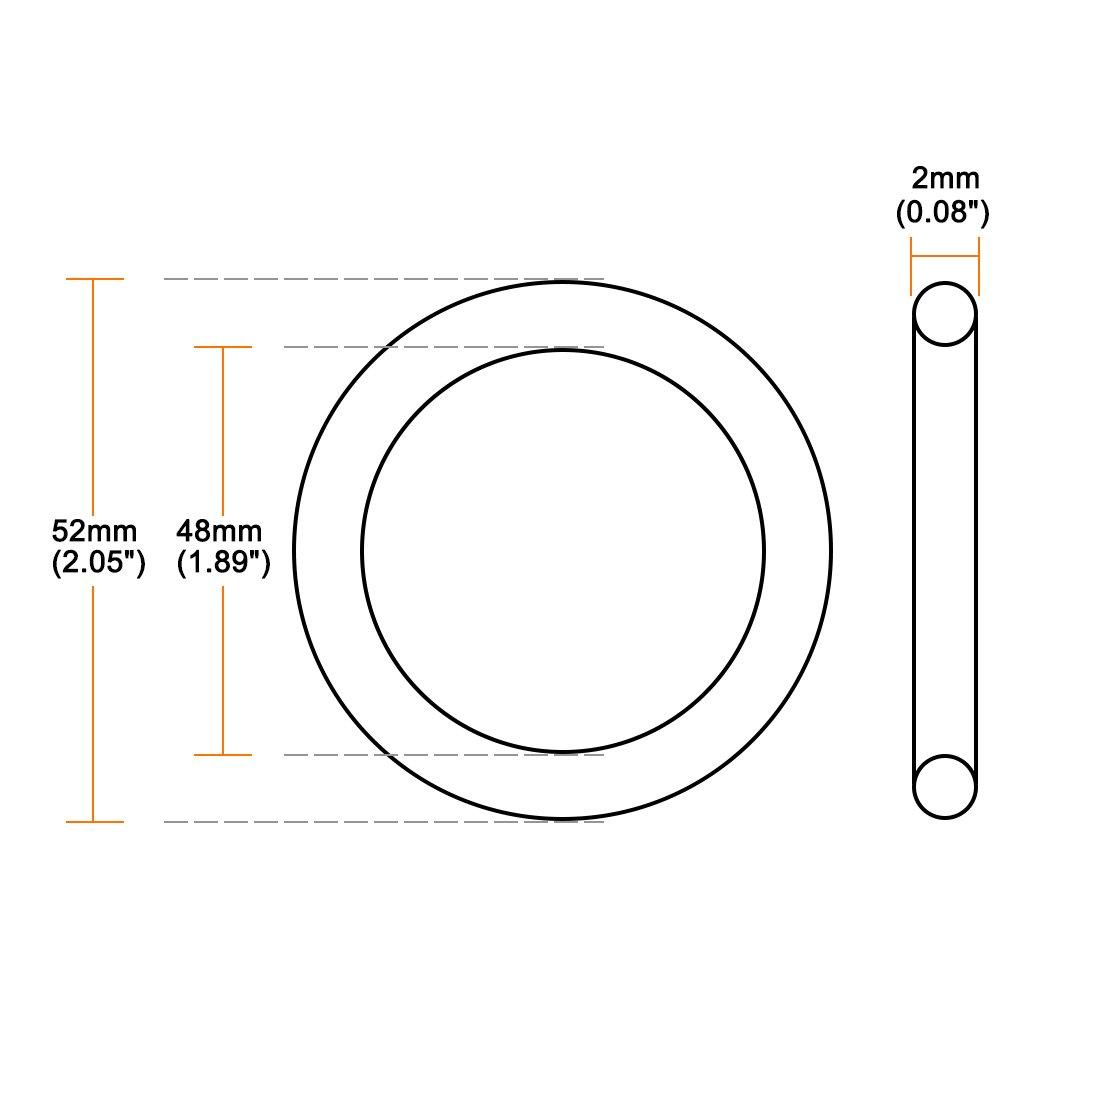 sourcing map 10pcs O-Ringe Nitrilkautschuk 45mm x 49mm x 2mm Dichtungsringe Gummiabdichtung DE